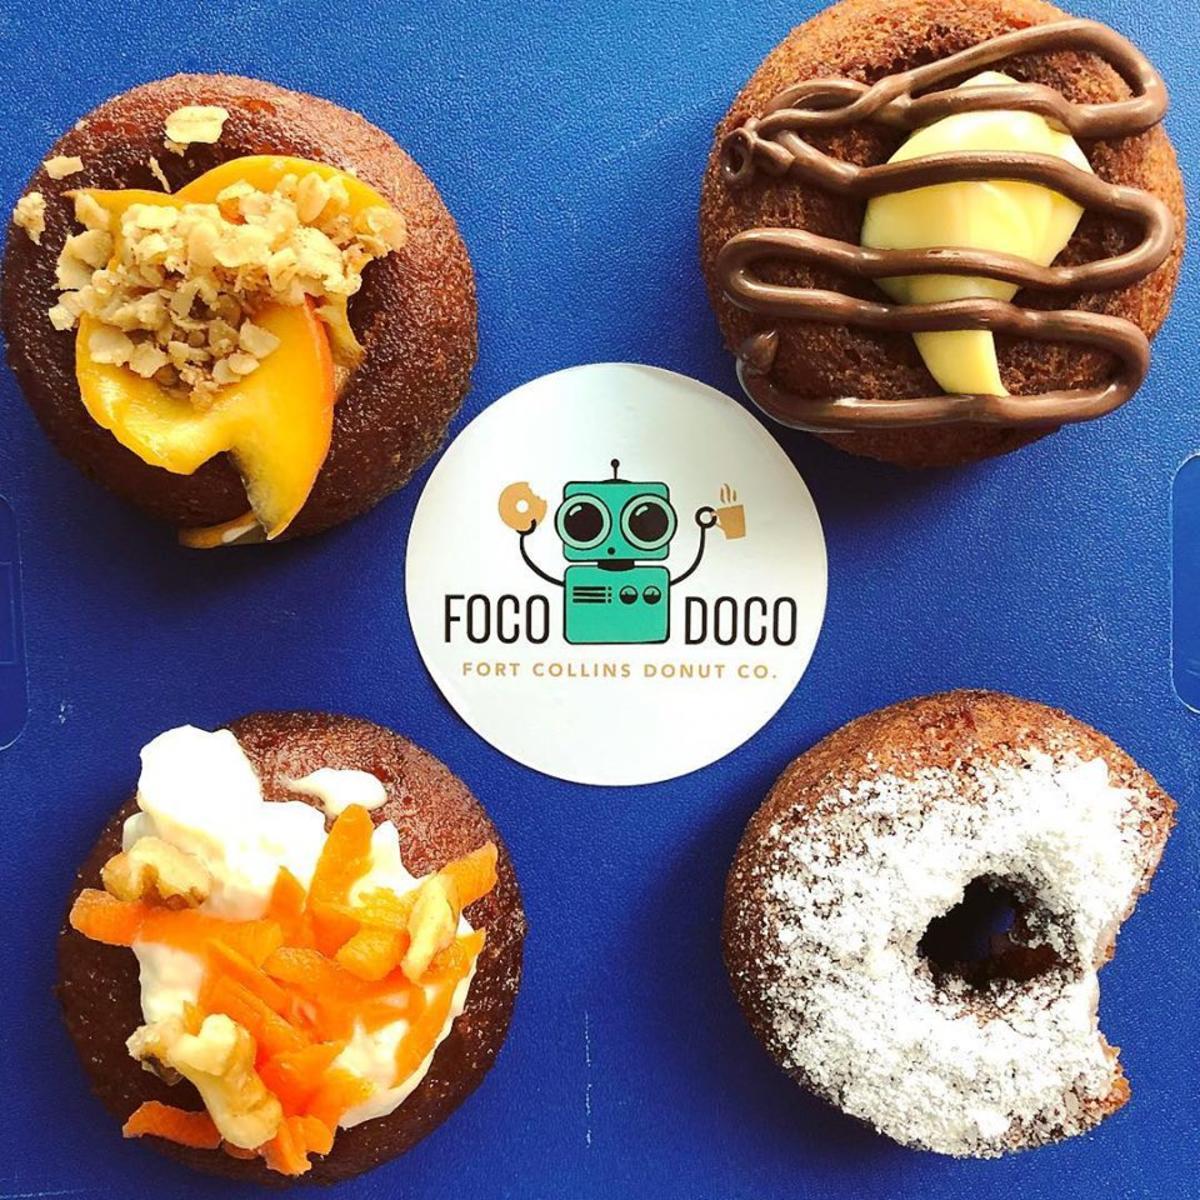 FoCo DoCo donuts and sticker